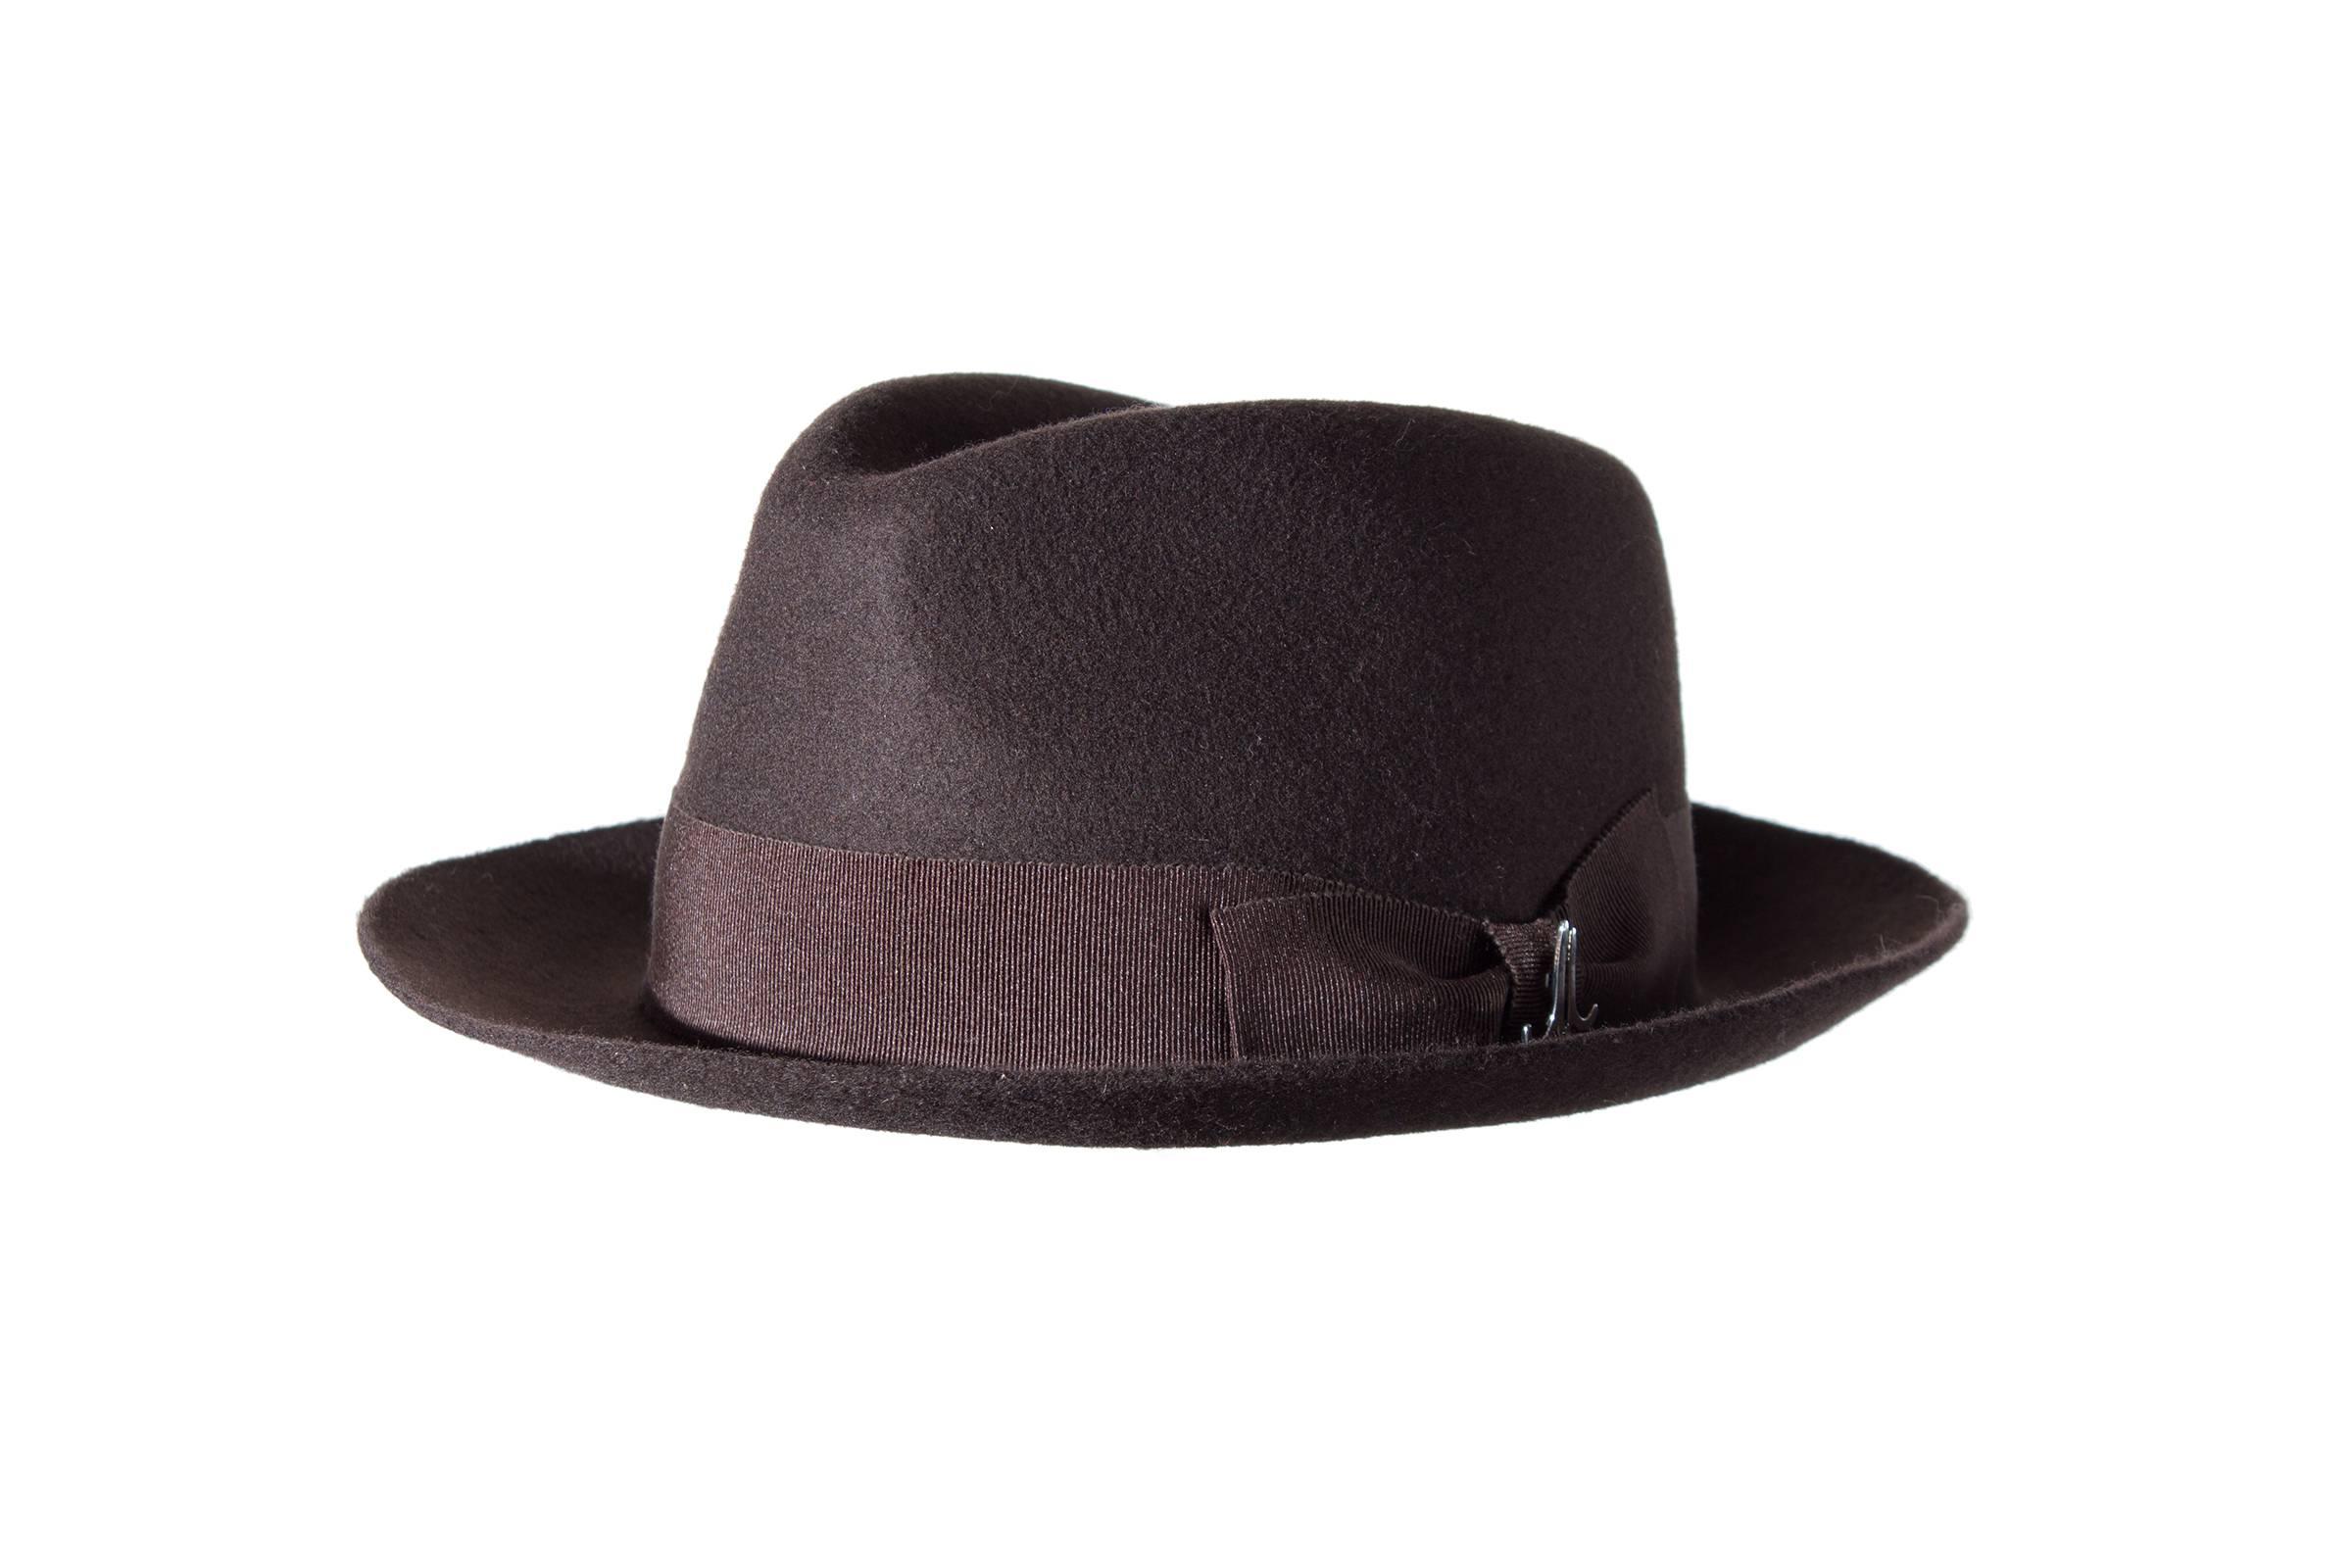 gentleman's hat GRAF THEO wool felt